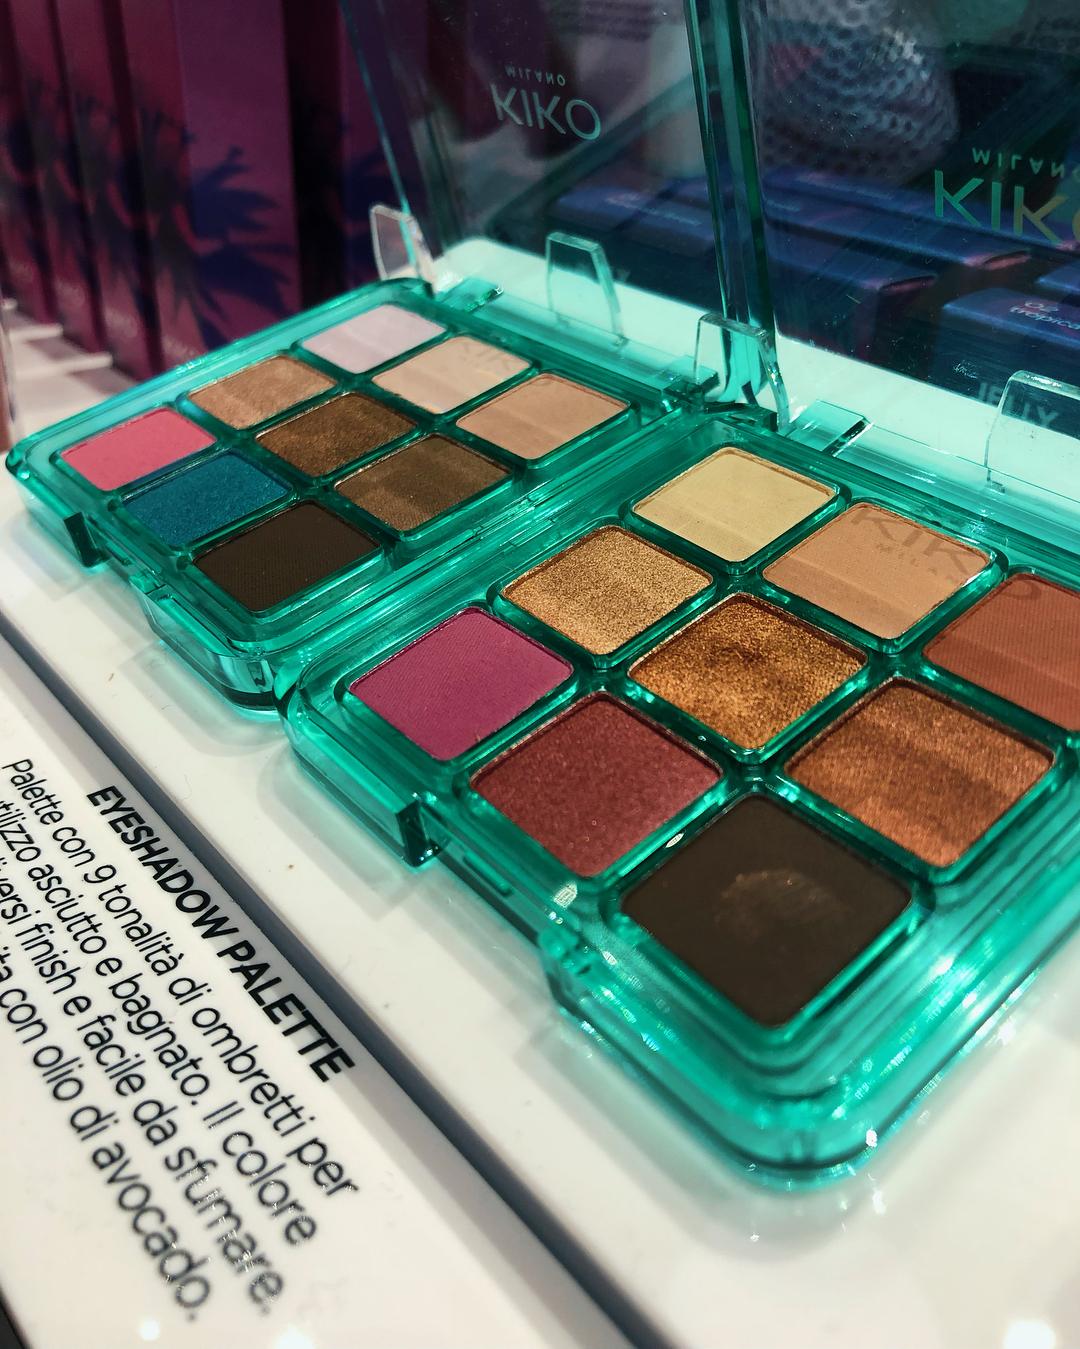 kiko-jelly-jungle-eyeshadow-palette